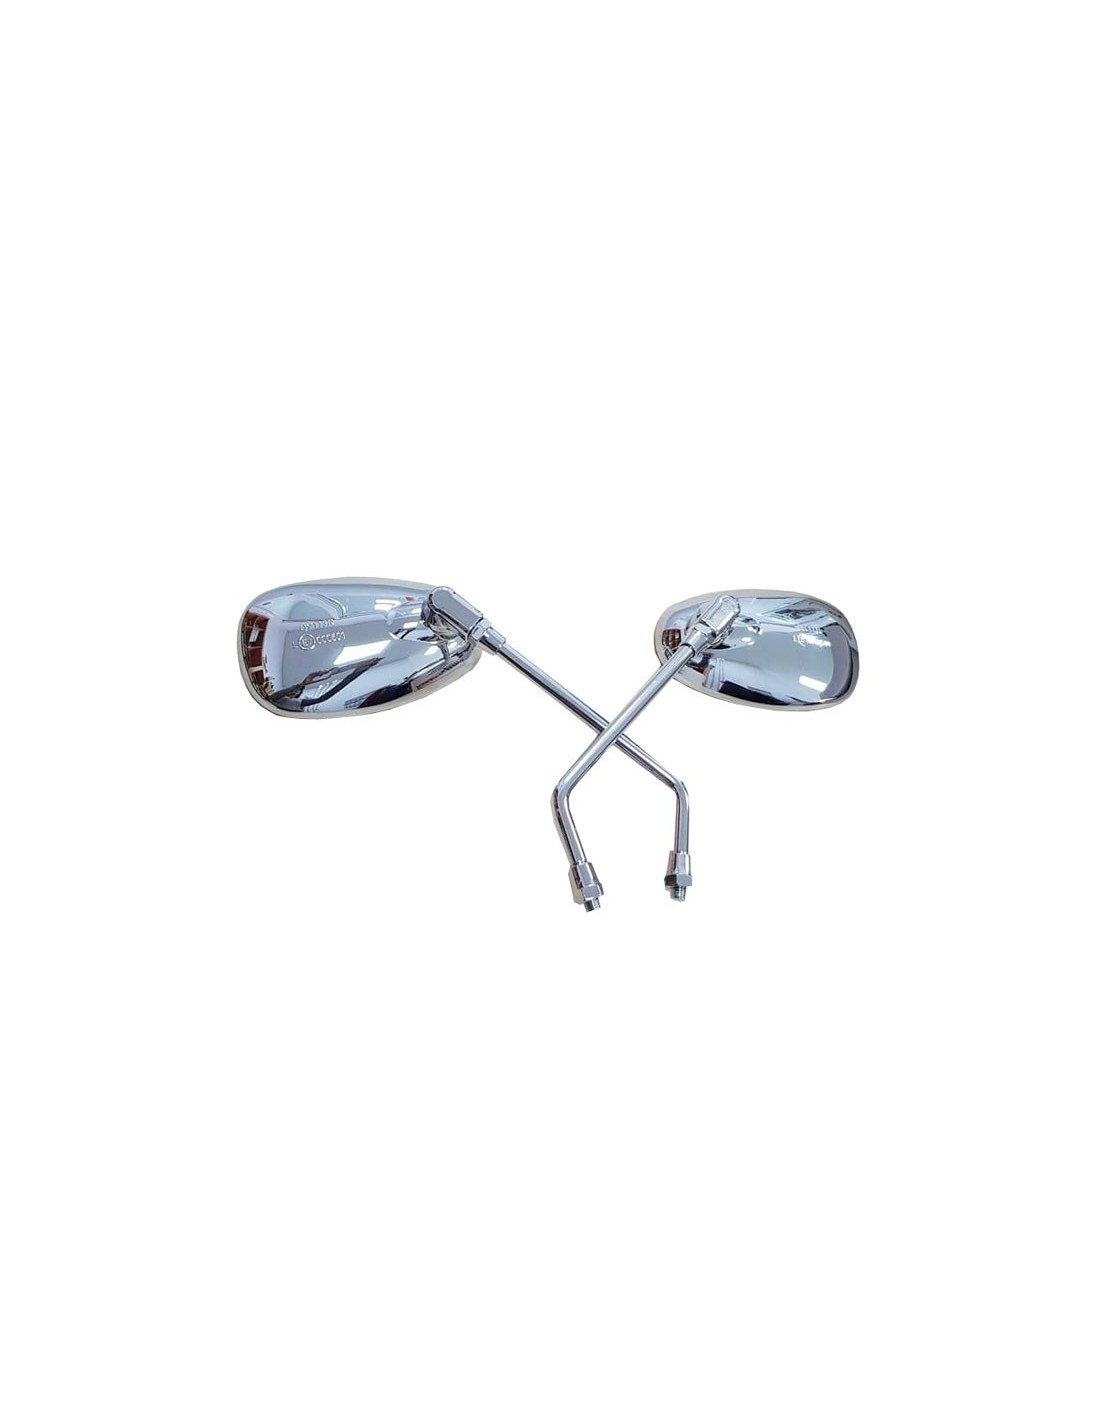 Espejos retrovisores cromados derecho + izquierdo 81-K064-01-4